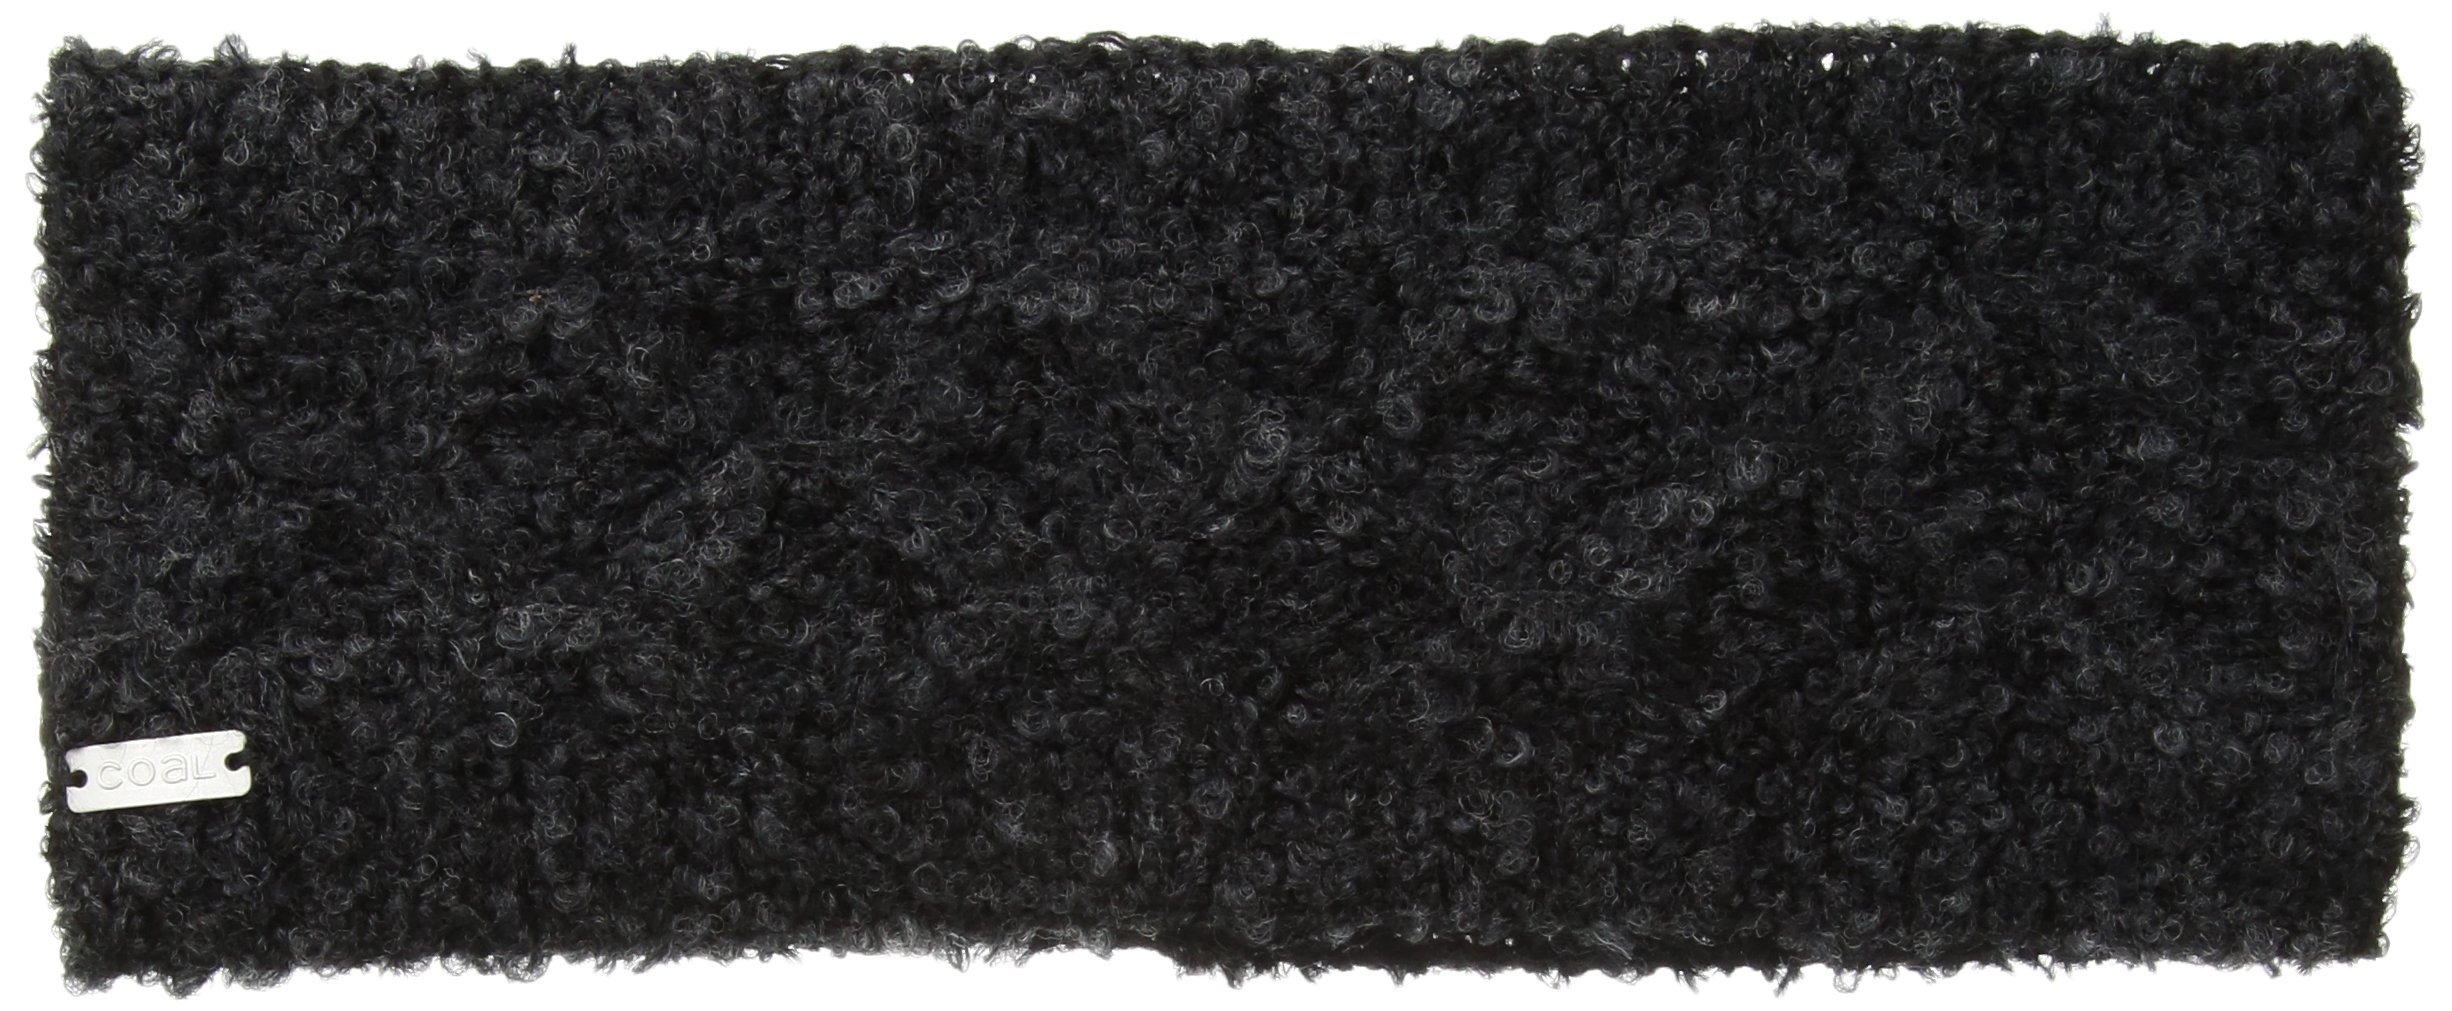 Coal Women's The Sophie Headband, black, One Size